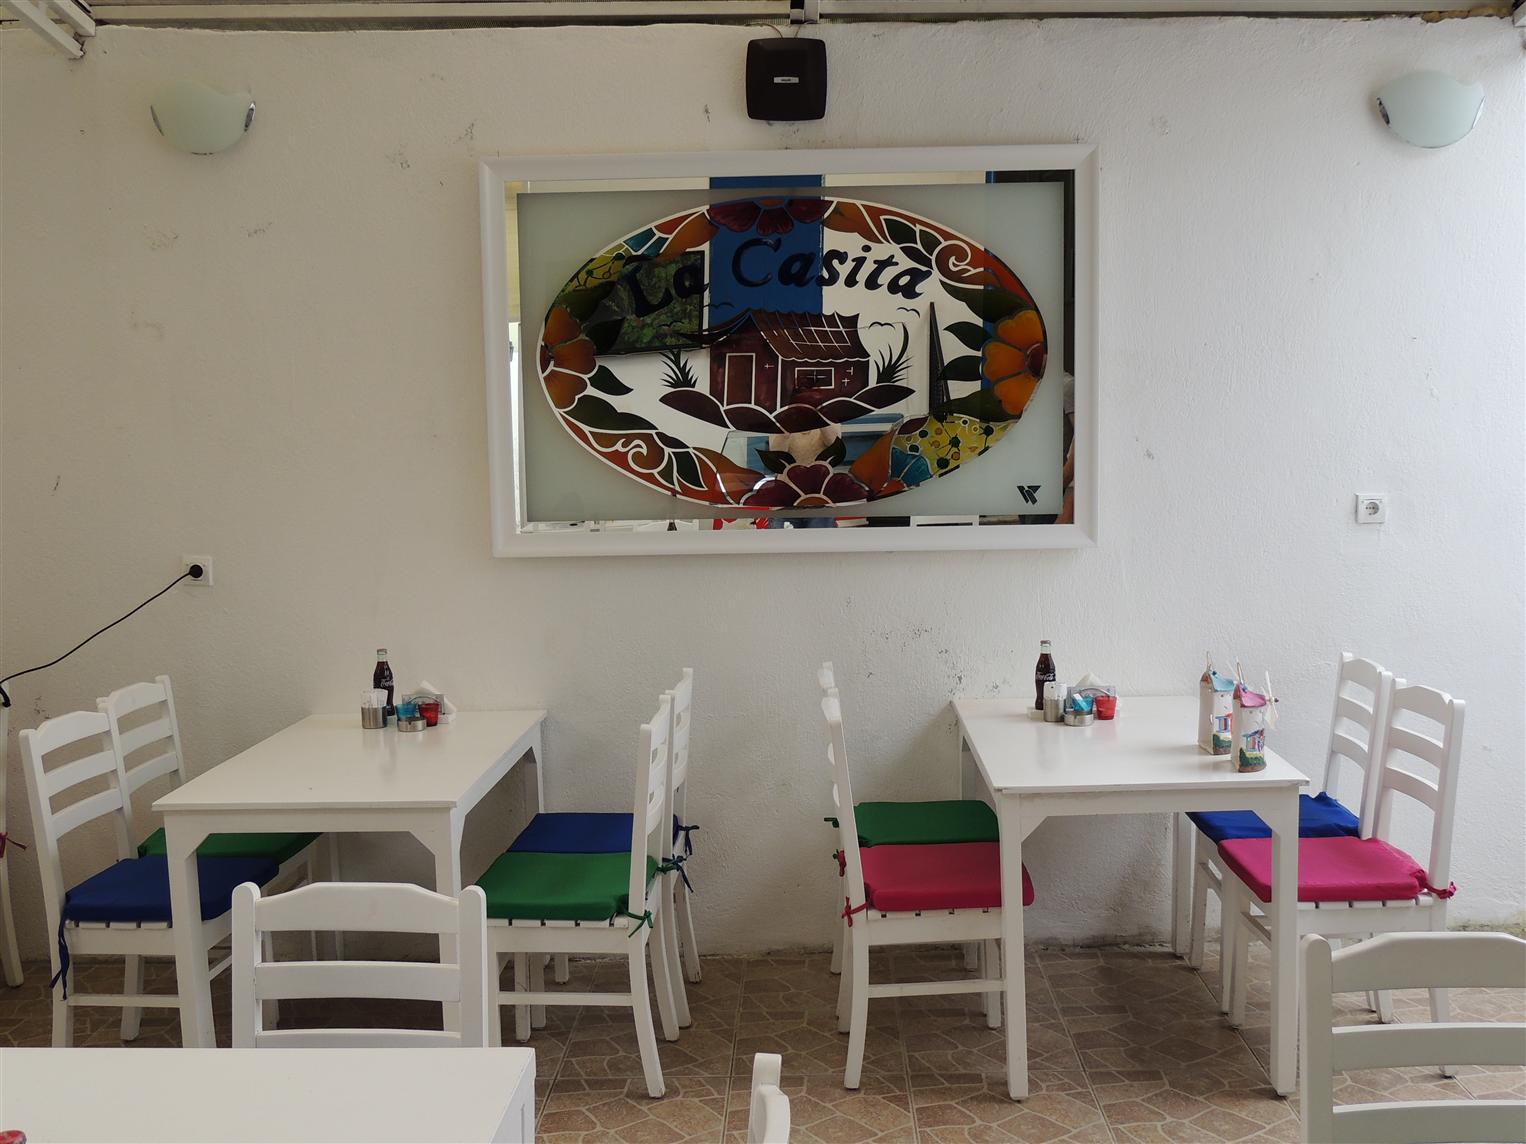 la-casita-cafe201592285050442.jpg izmir vitray çalışması